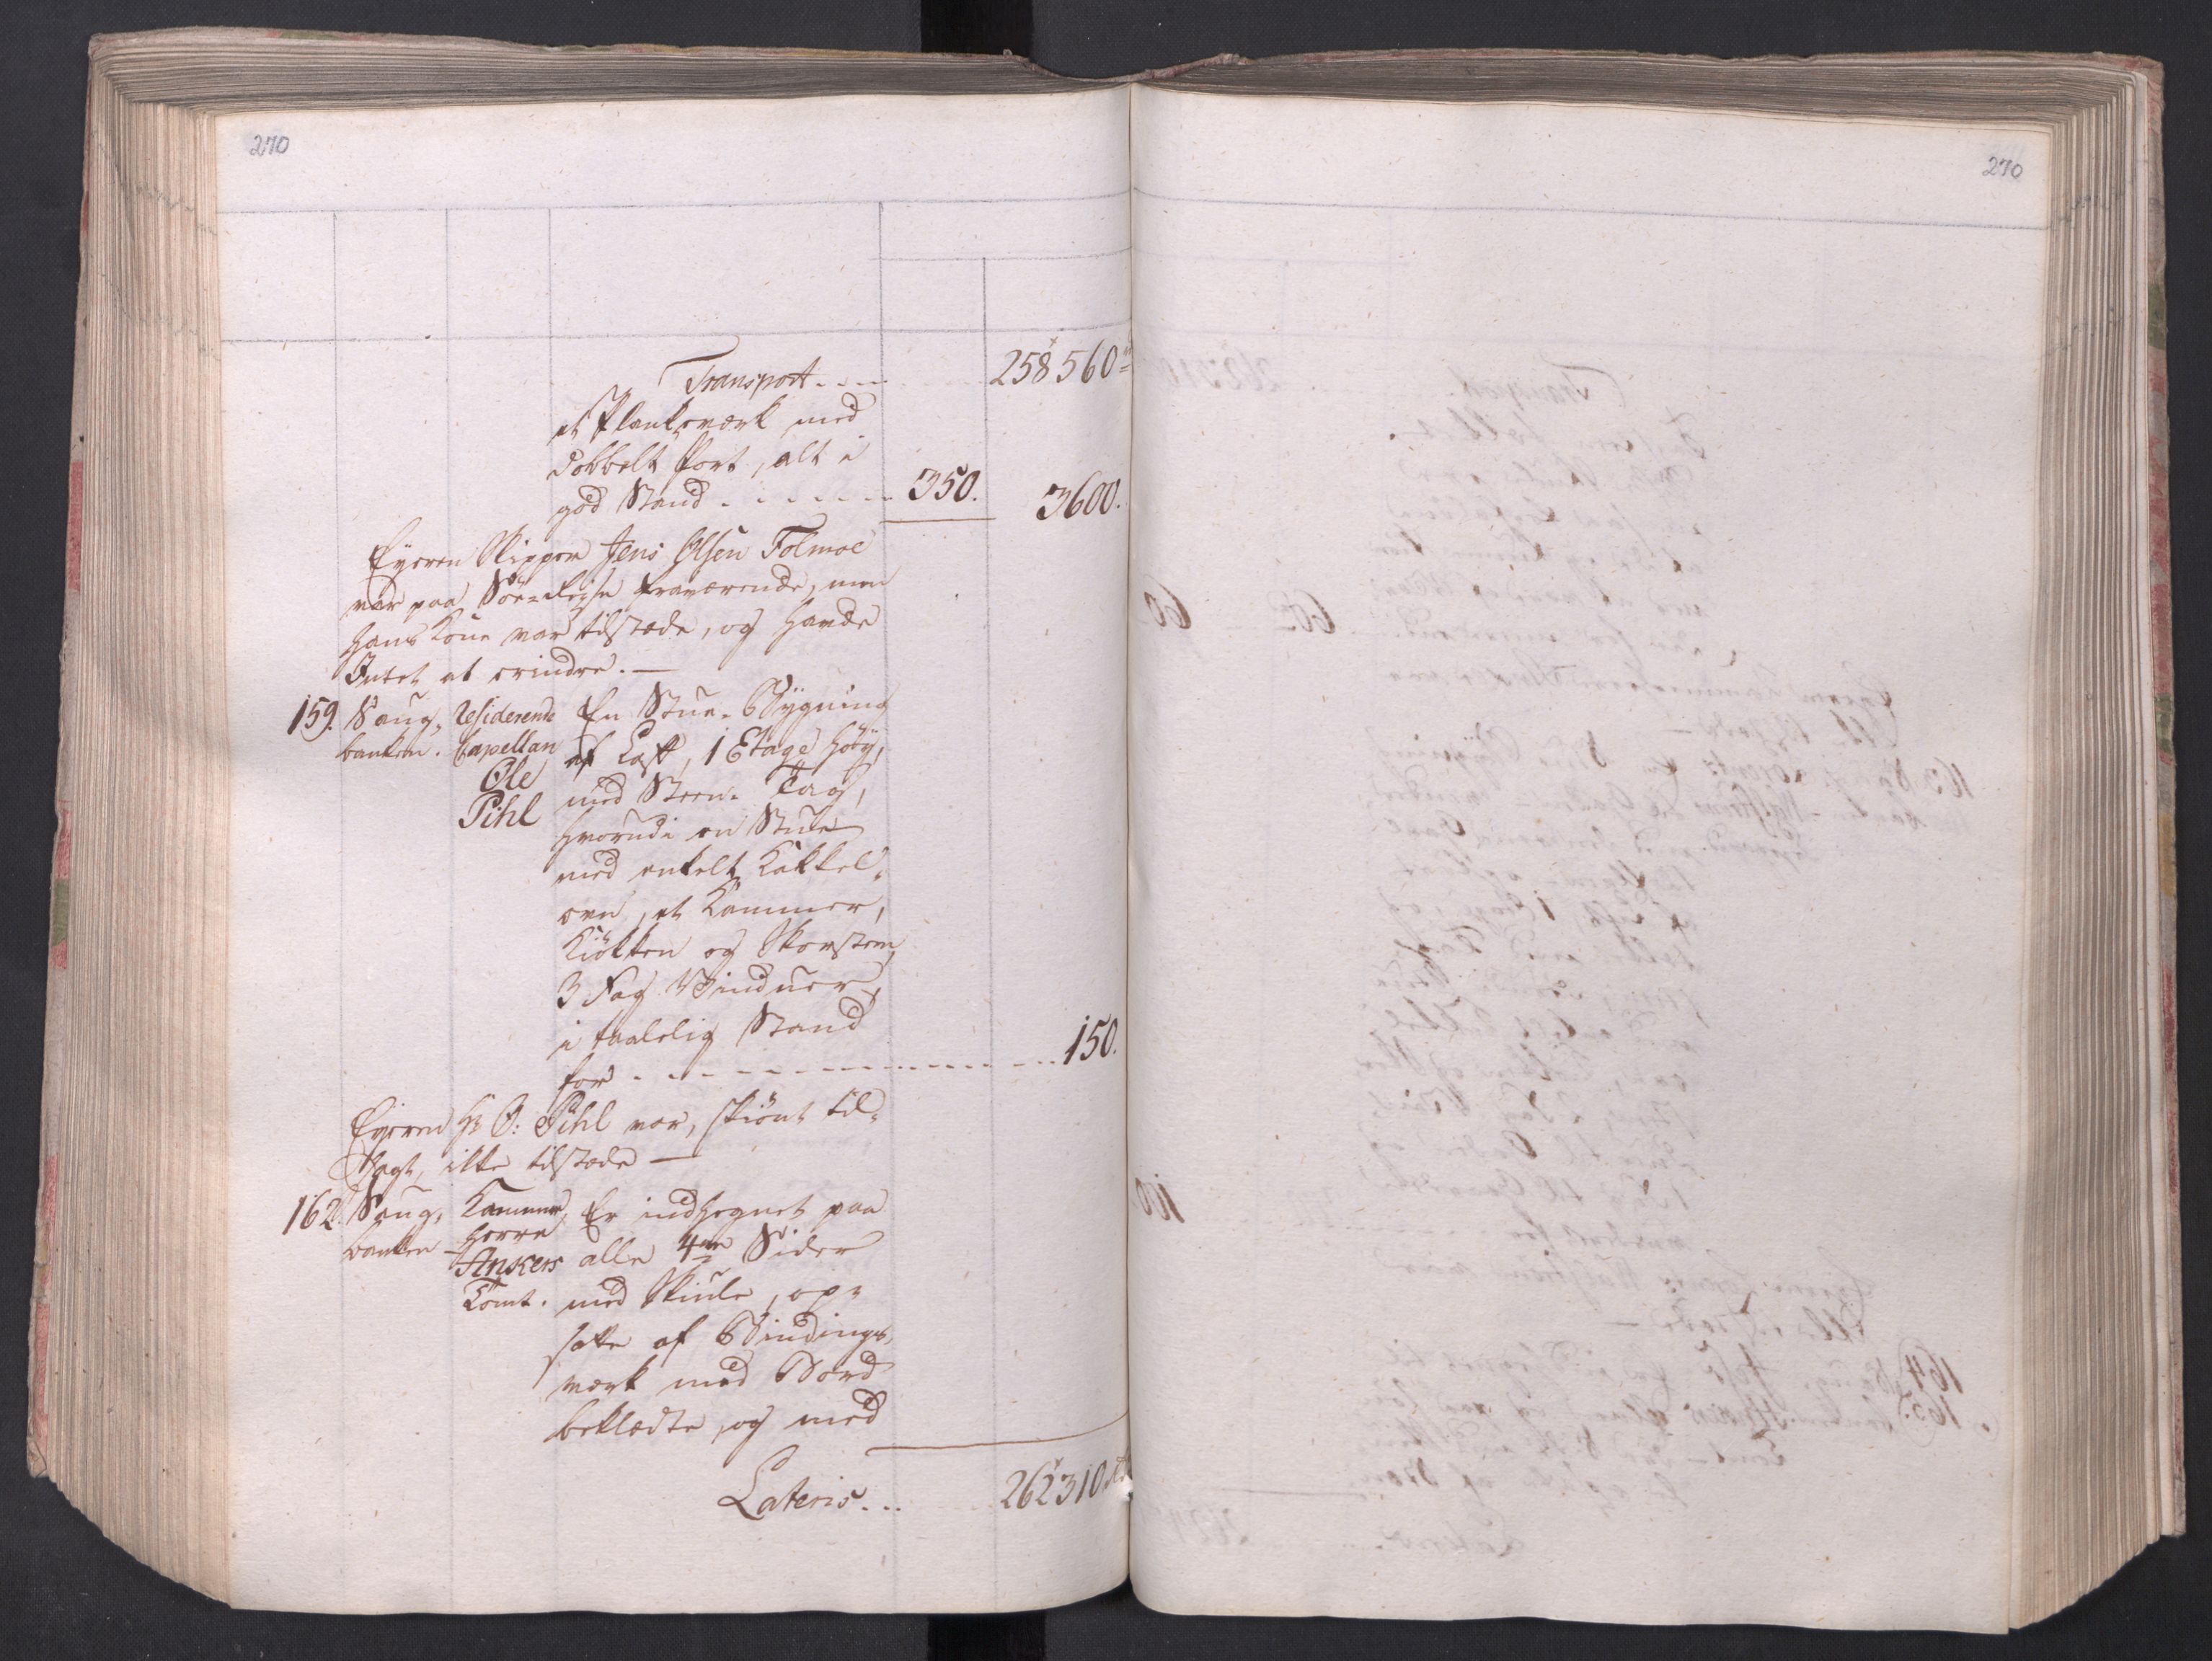 SAO, Kristiania stiftamt, I/Ia/L0015: Branntakster, 1797, s. 270